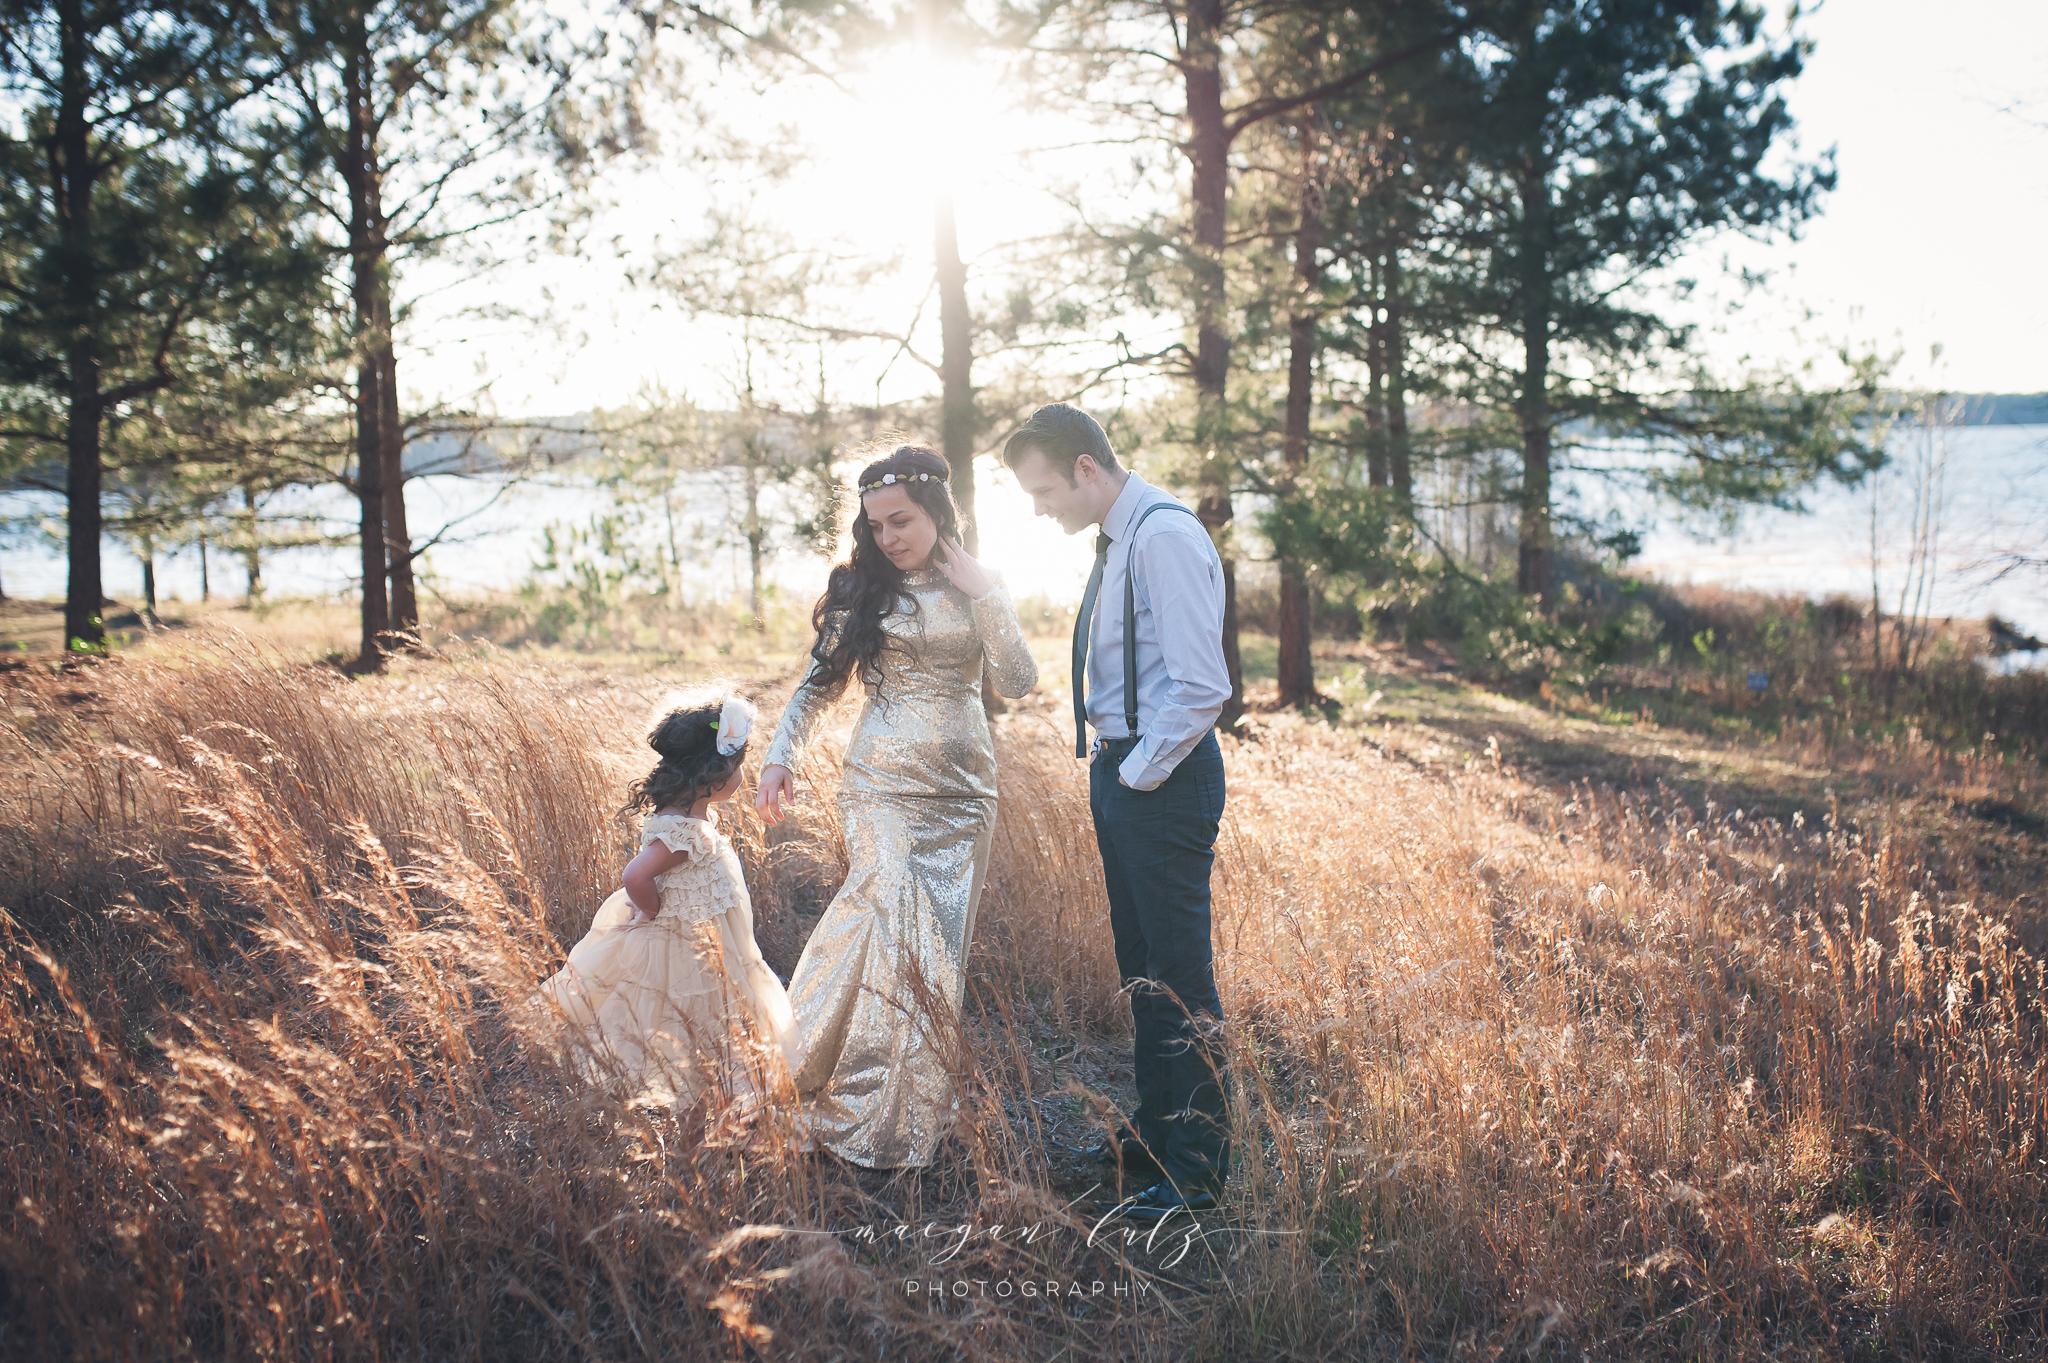 French-Family-Sunset-Photo-Session_NEPA-Photographer_Maeganlutzphotography-855-Edit.jpg